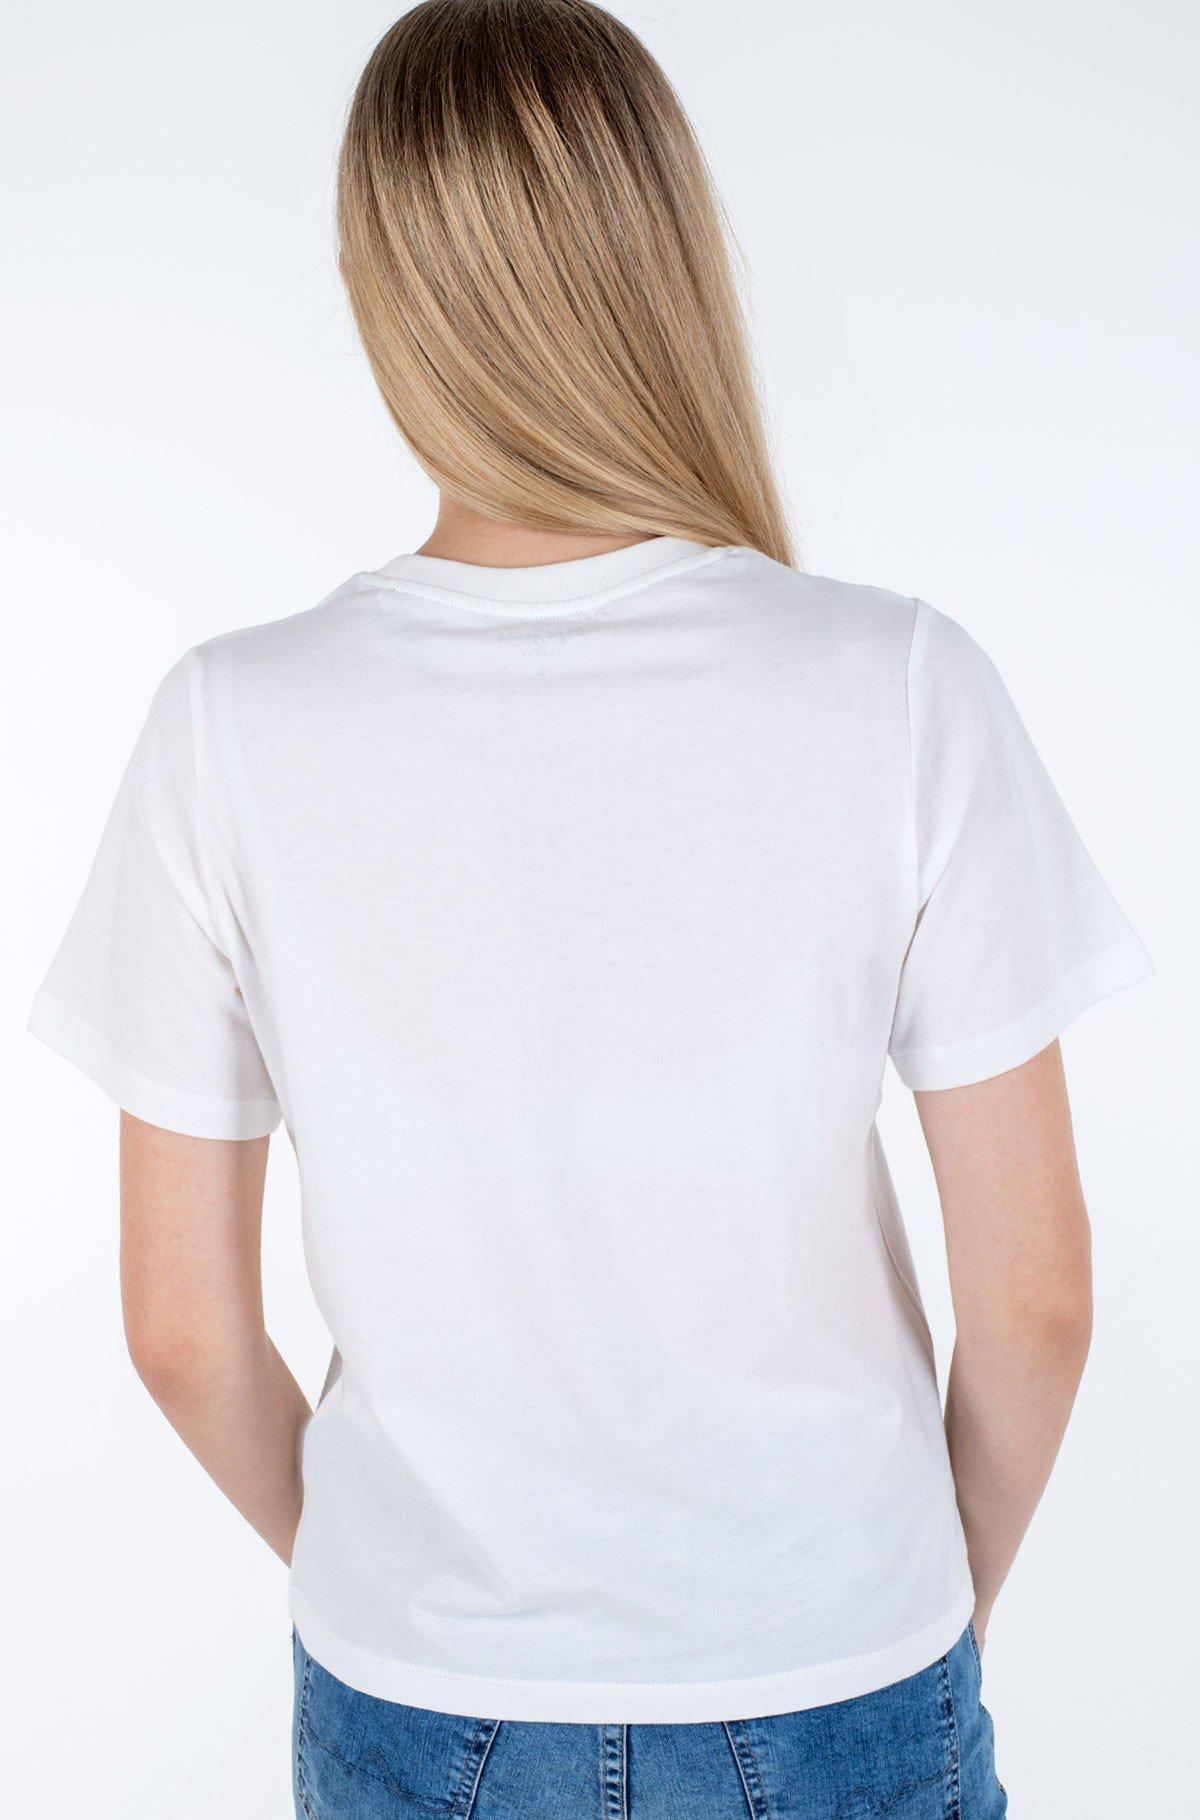 T-shirt ALISSA/PL504516-full-2